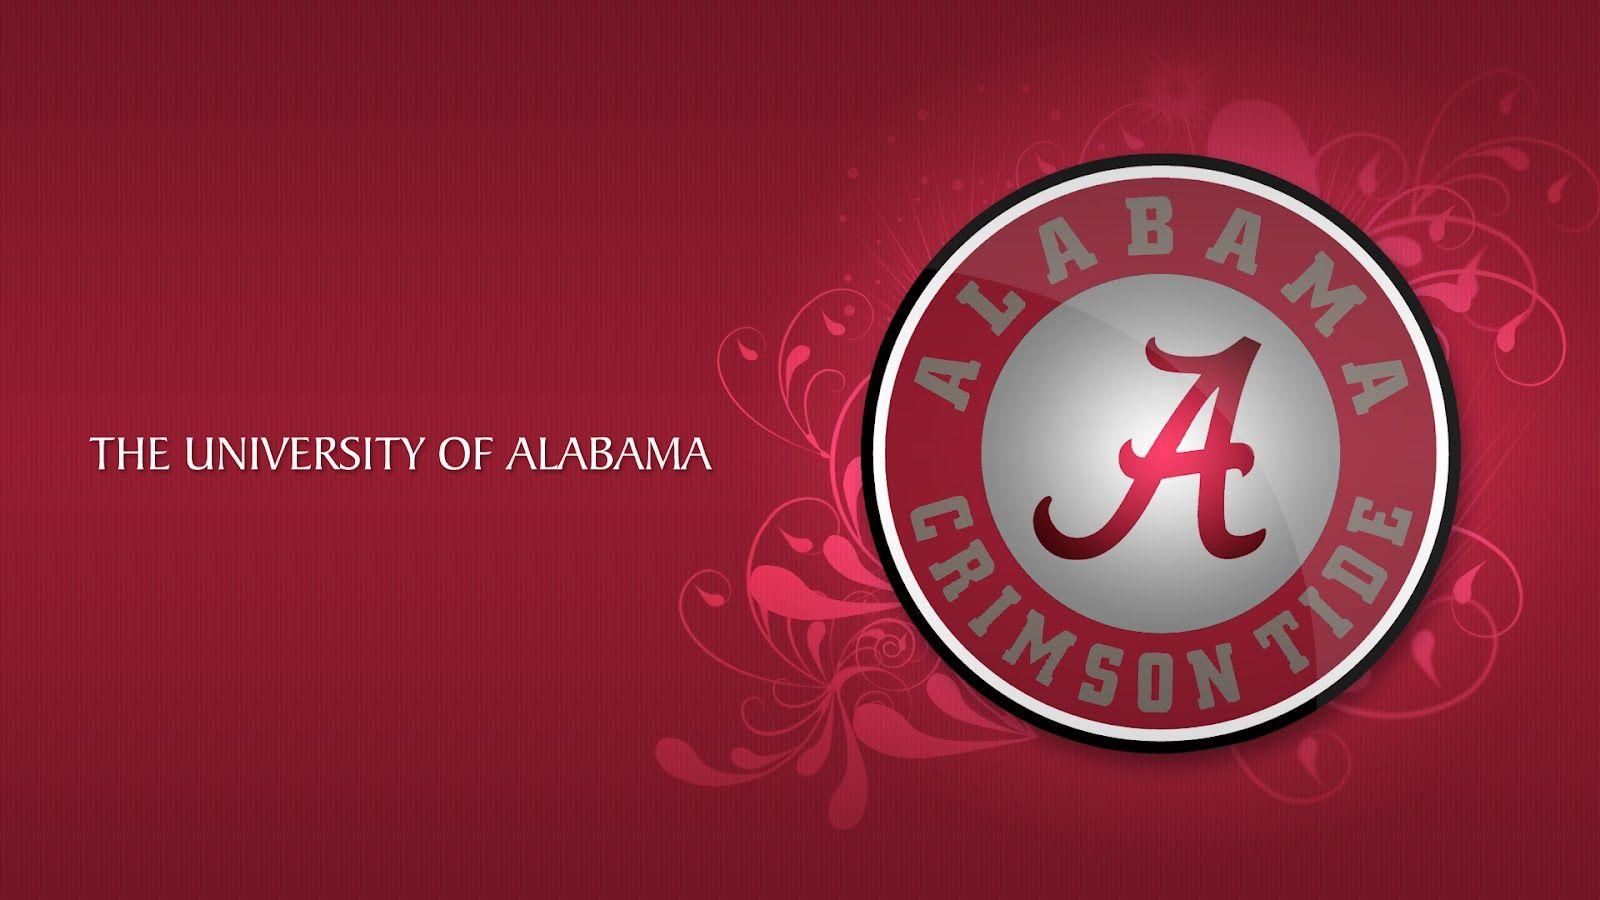 University Of Alabama Crimson Tide Alabama Crimson Tide Logo Alabama Crimson Tide Alabama Crimson Tide Football Wallpaper